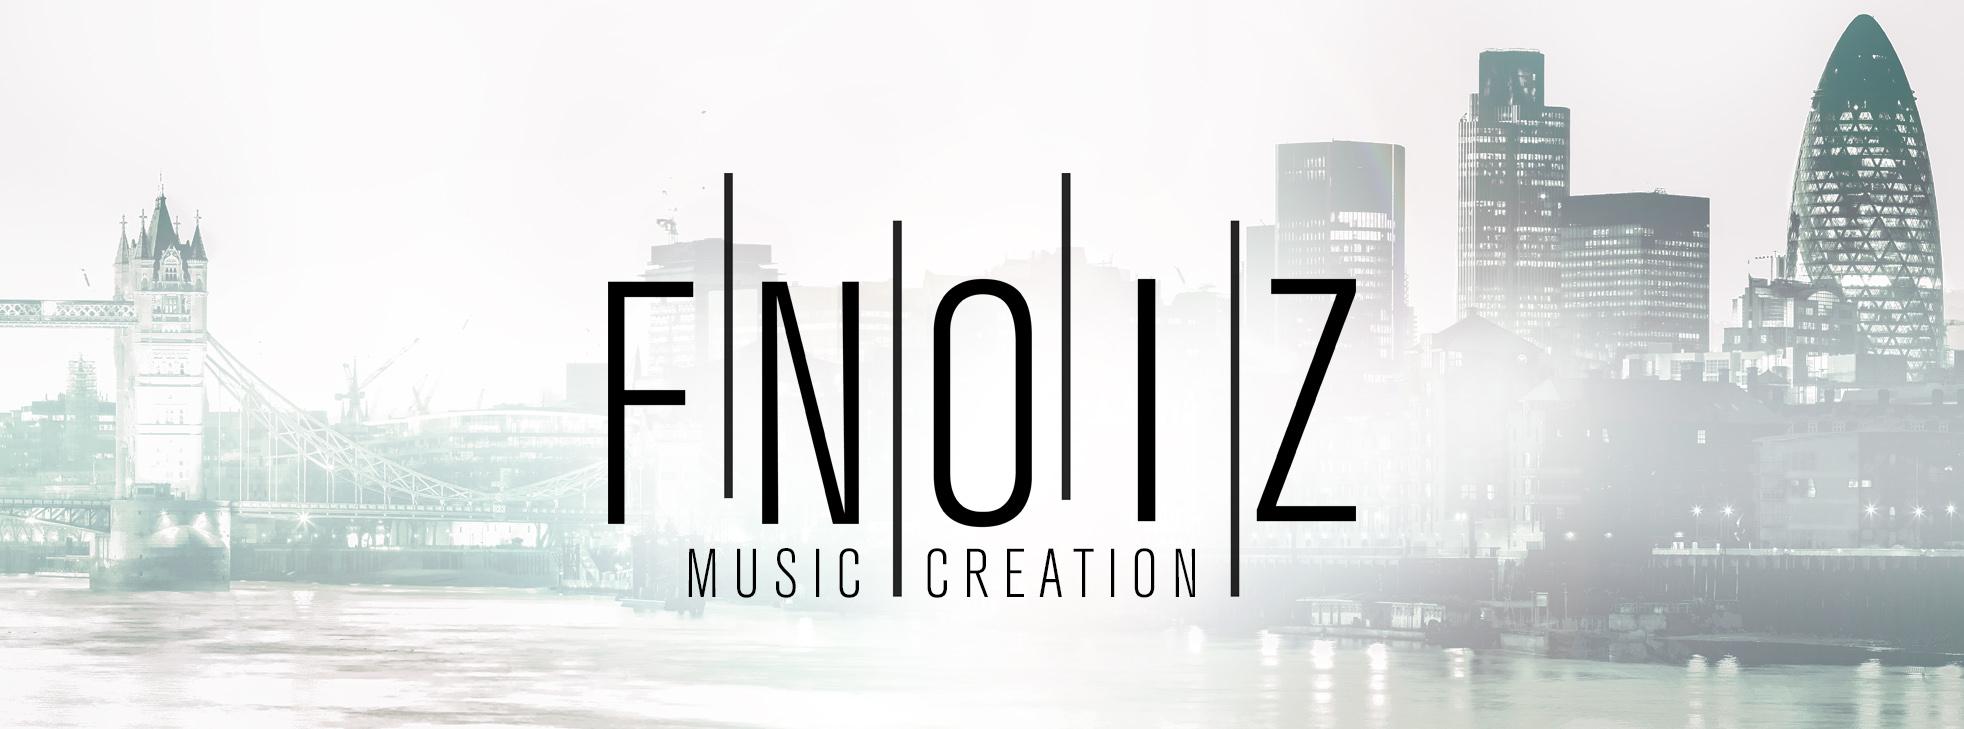 Fnoiz-cover